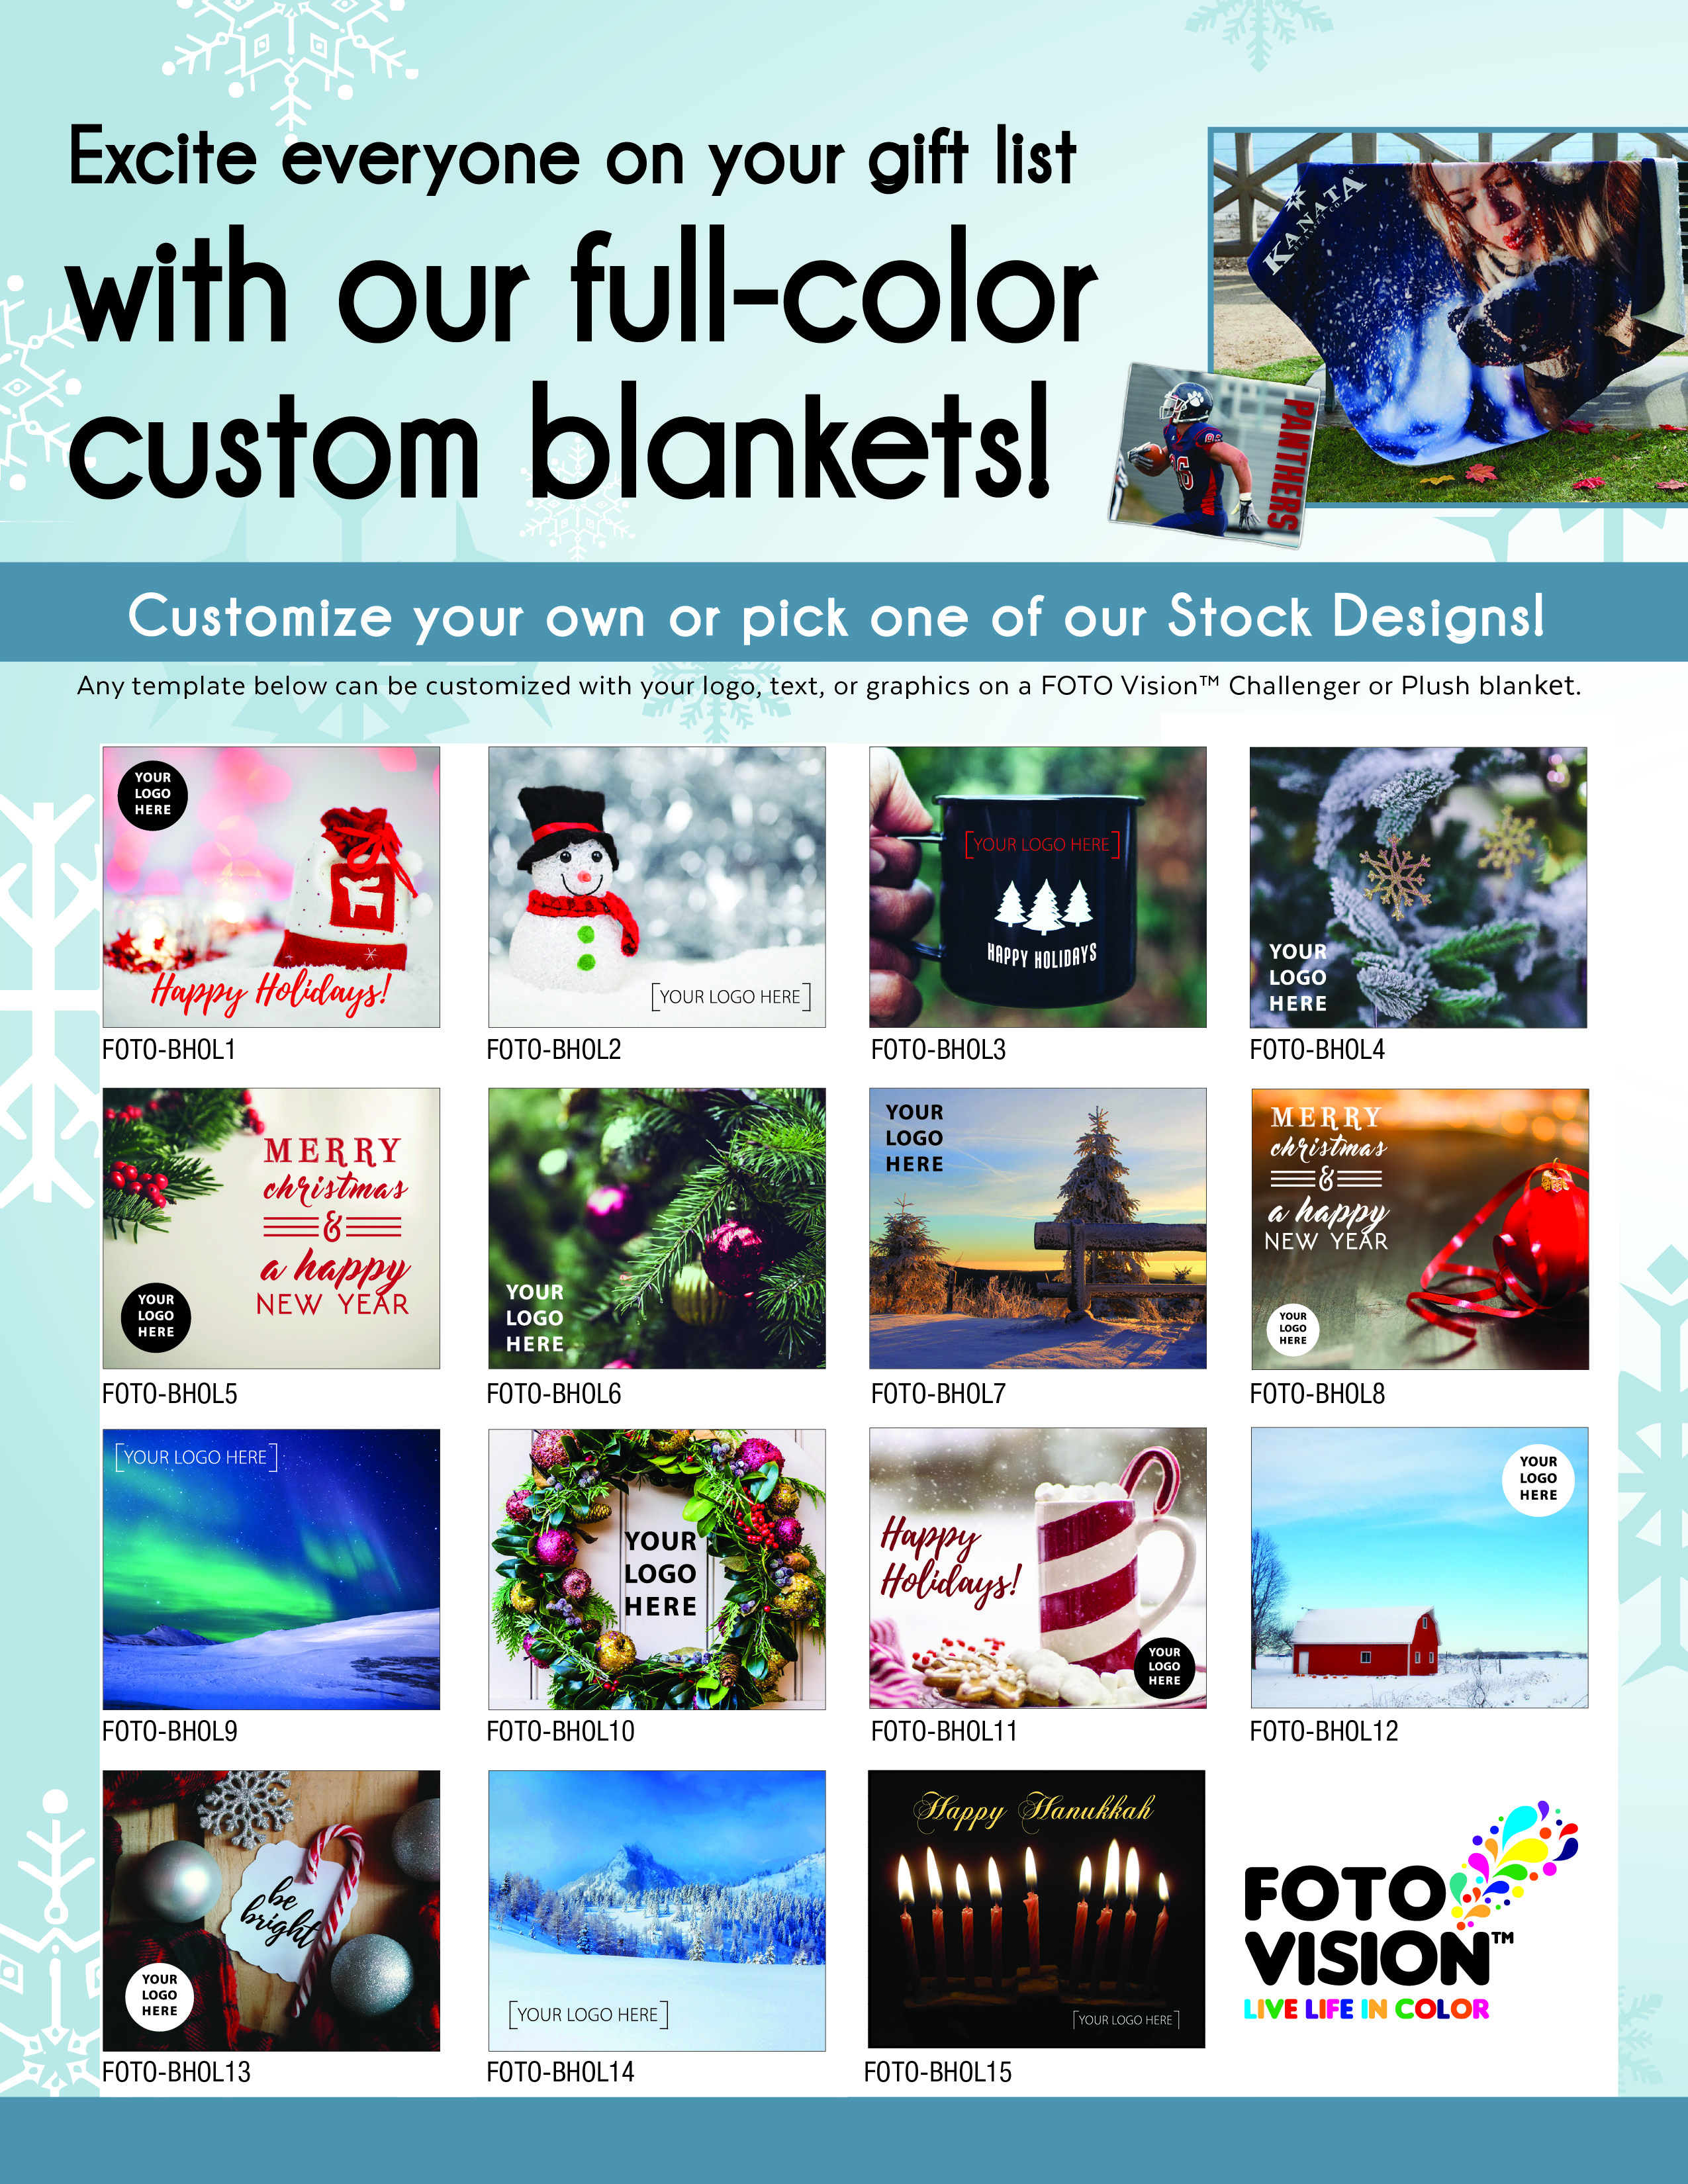 FOTOVisionHolidayTemplate-Flyer-V2